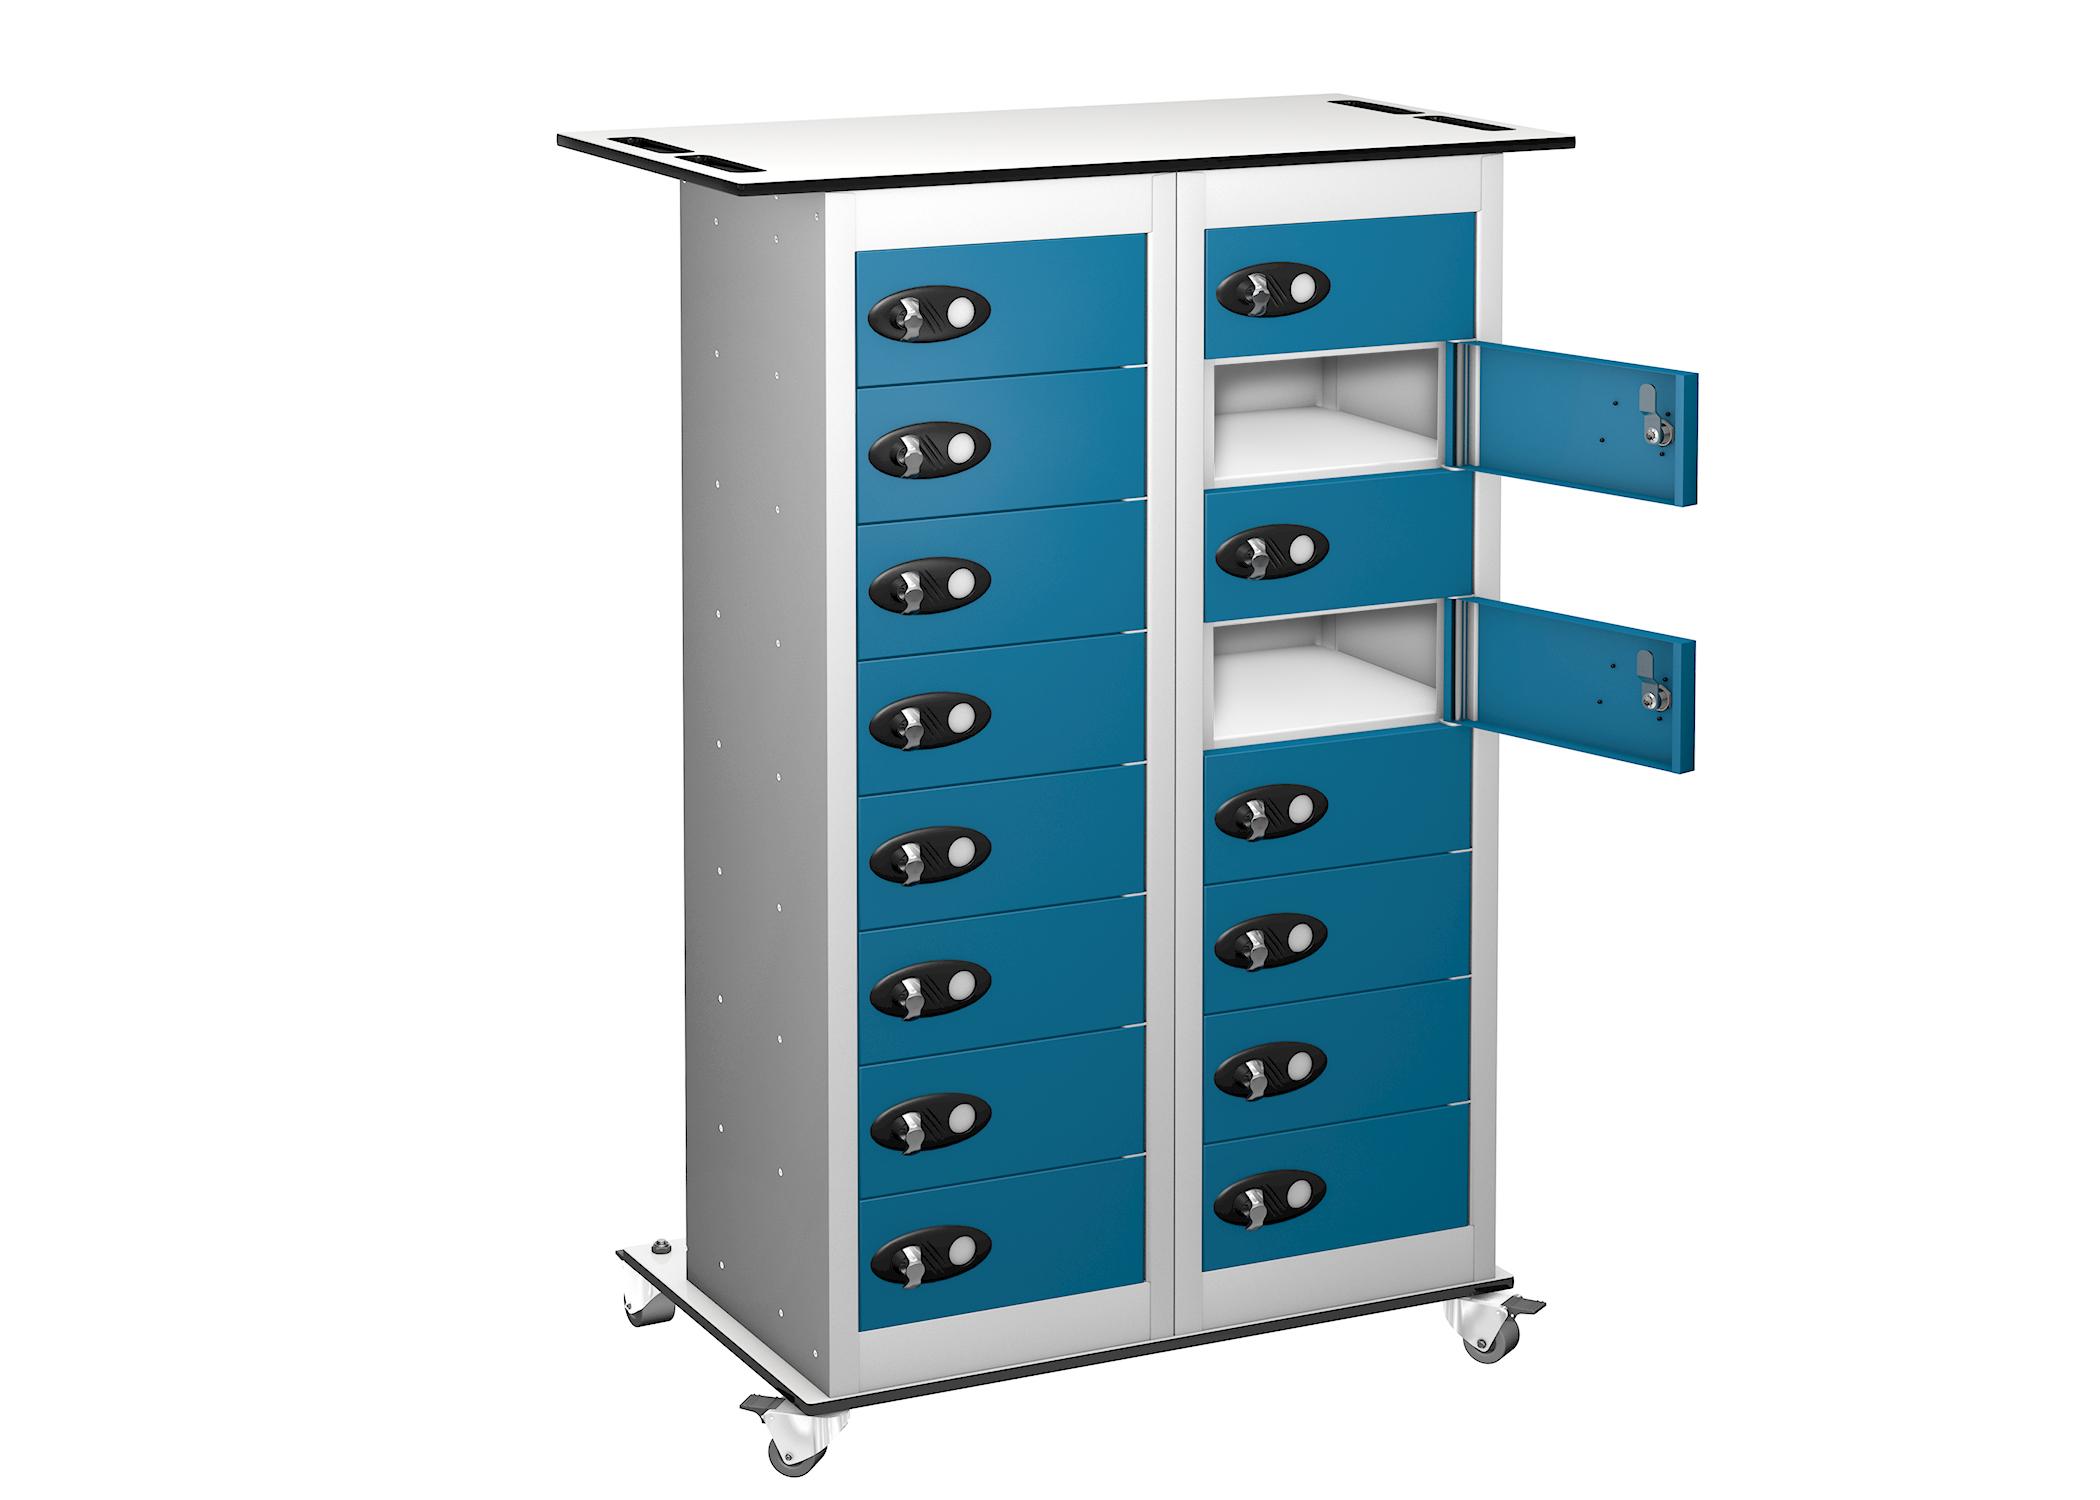 Trolley - Tablet Storage Locker -16 Compartments - 16 doors (Charging)